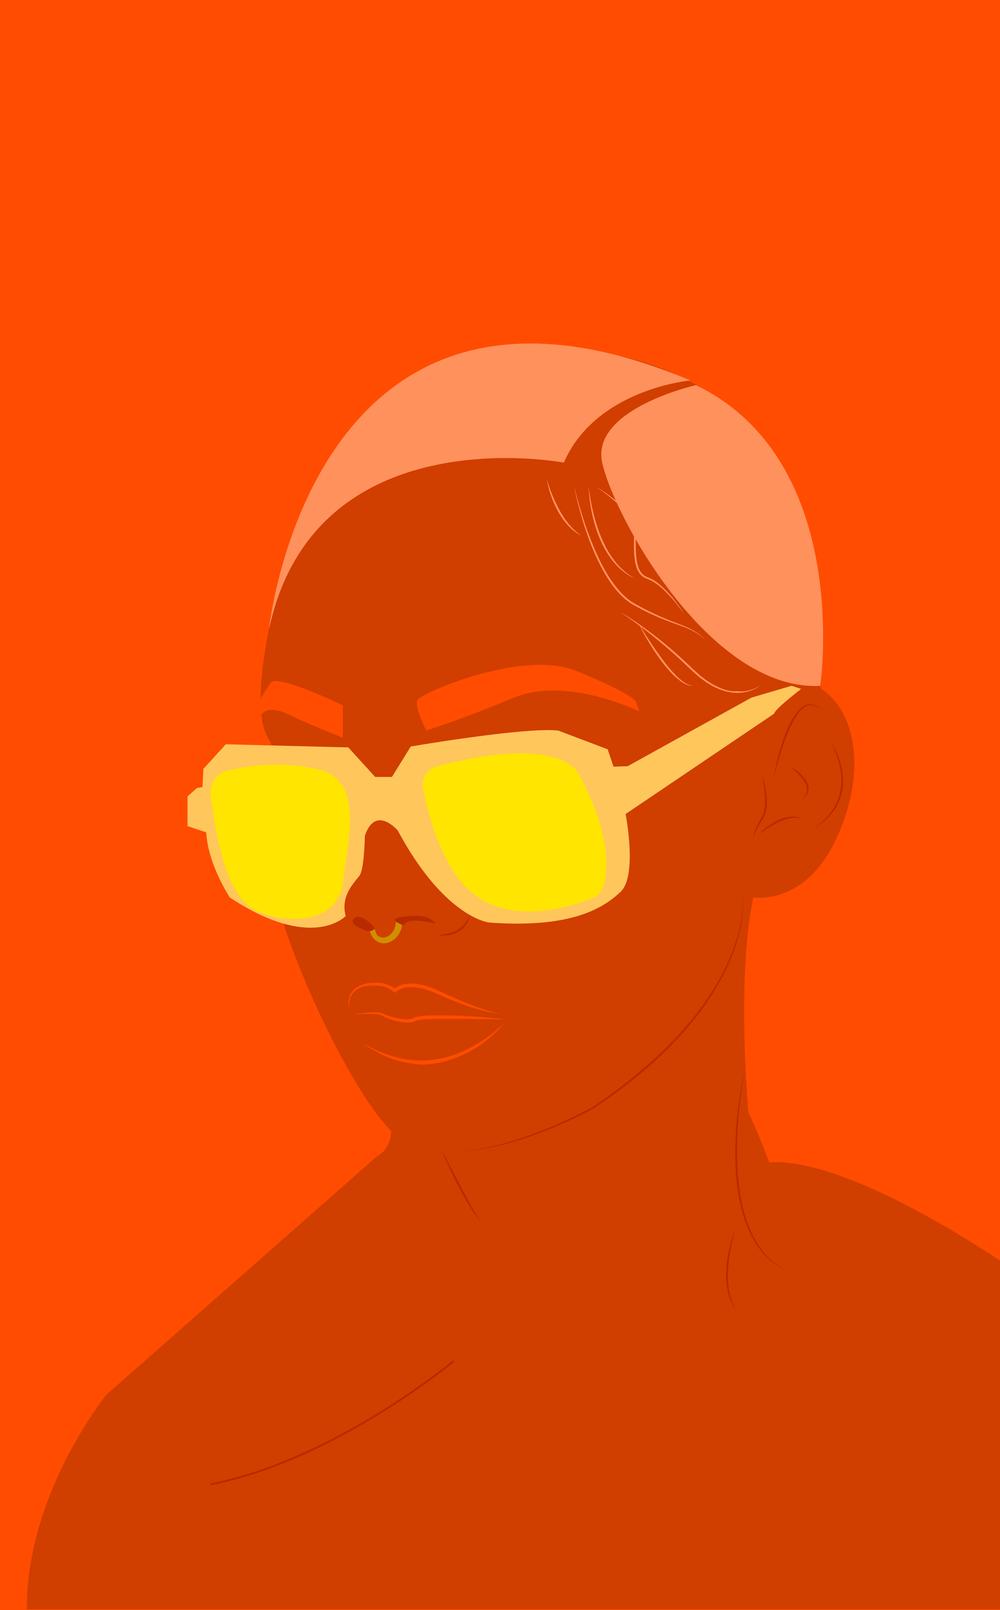 Sunglass Girl.png